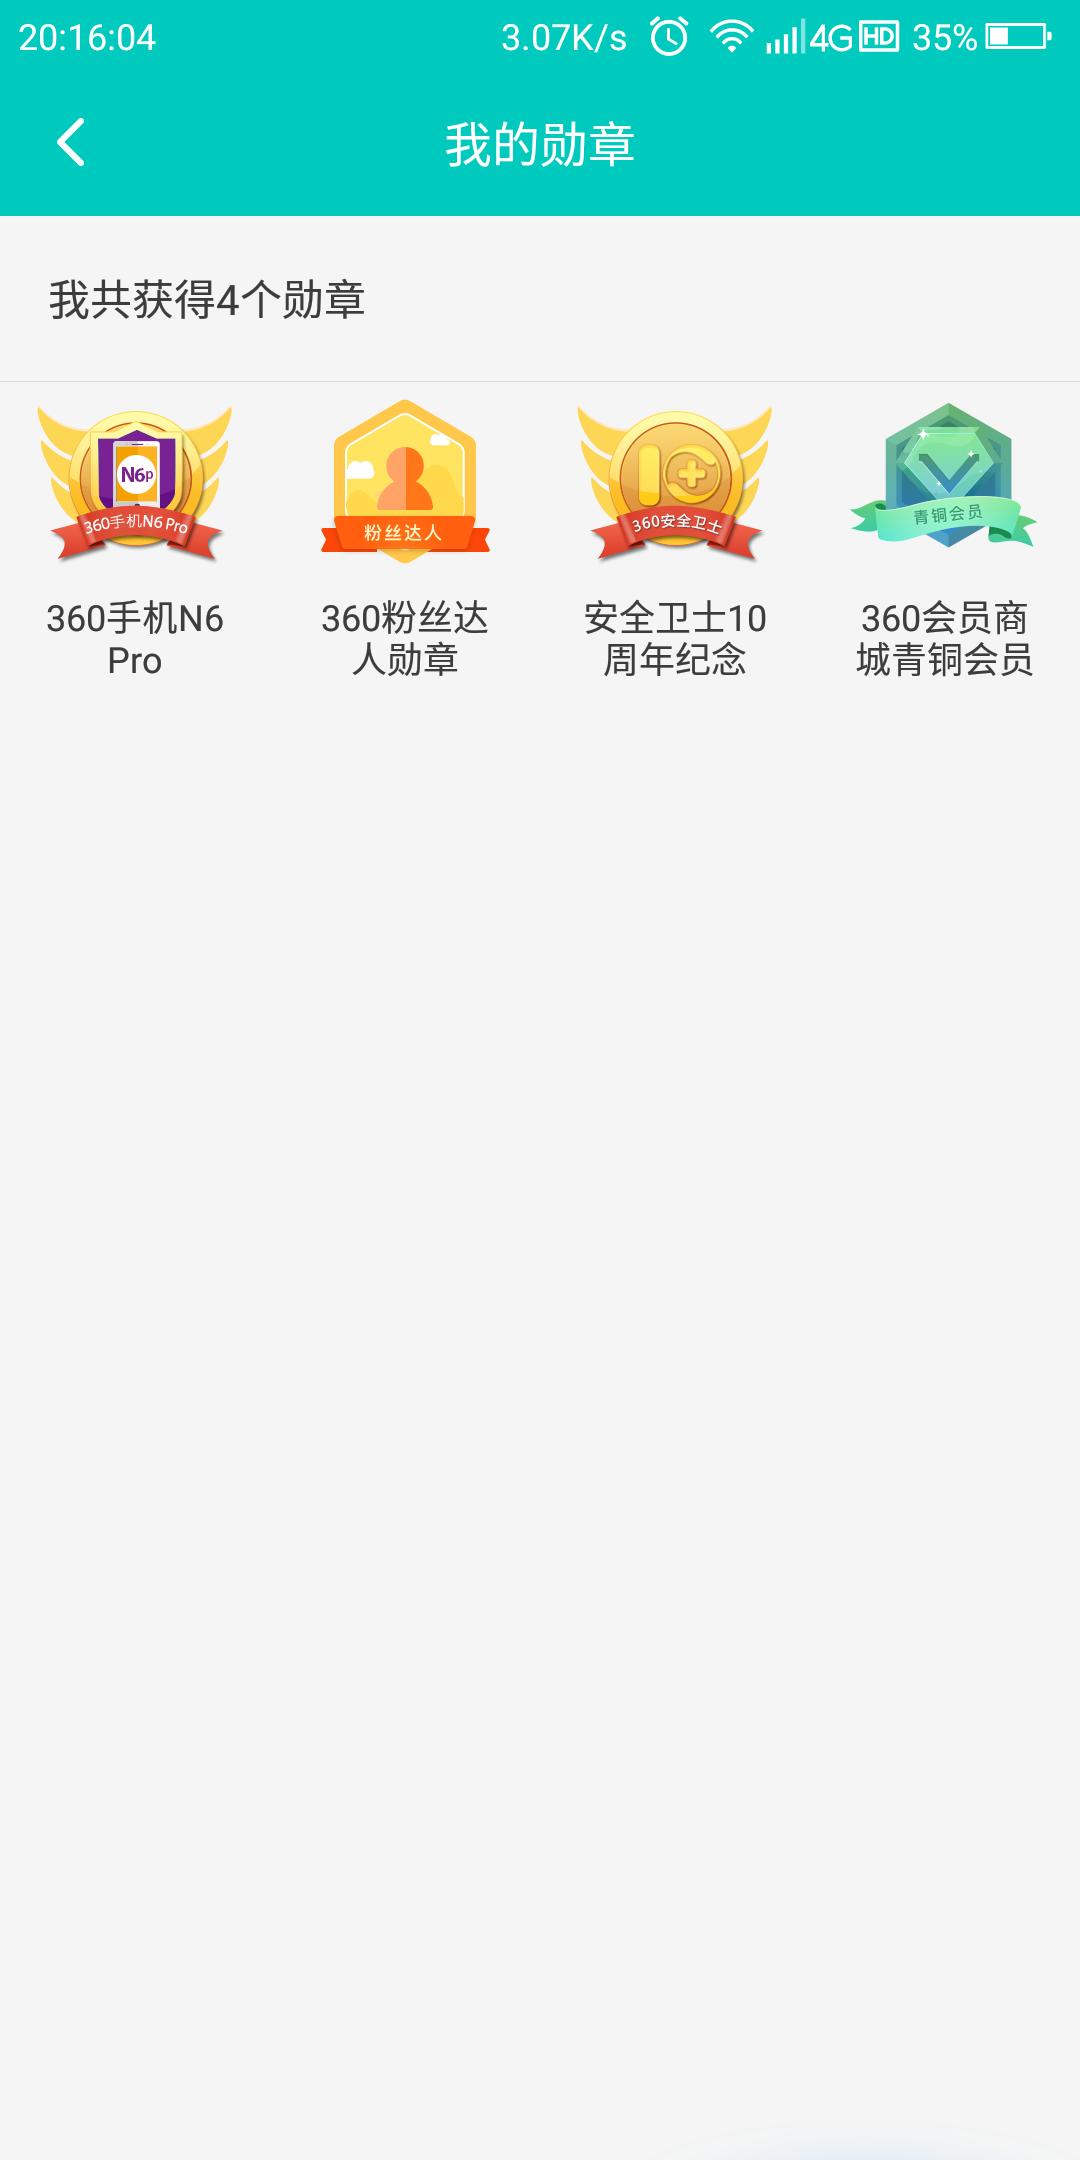 Screenshot_2019-09-01-20-16-06.png